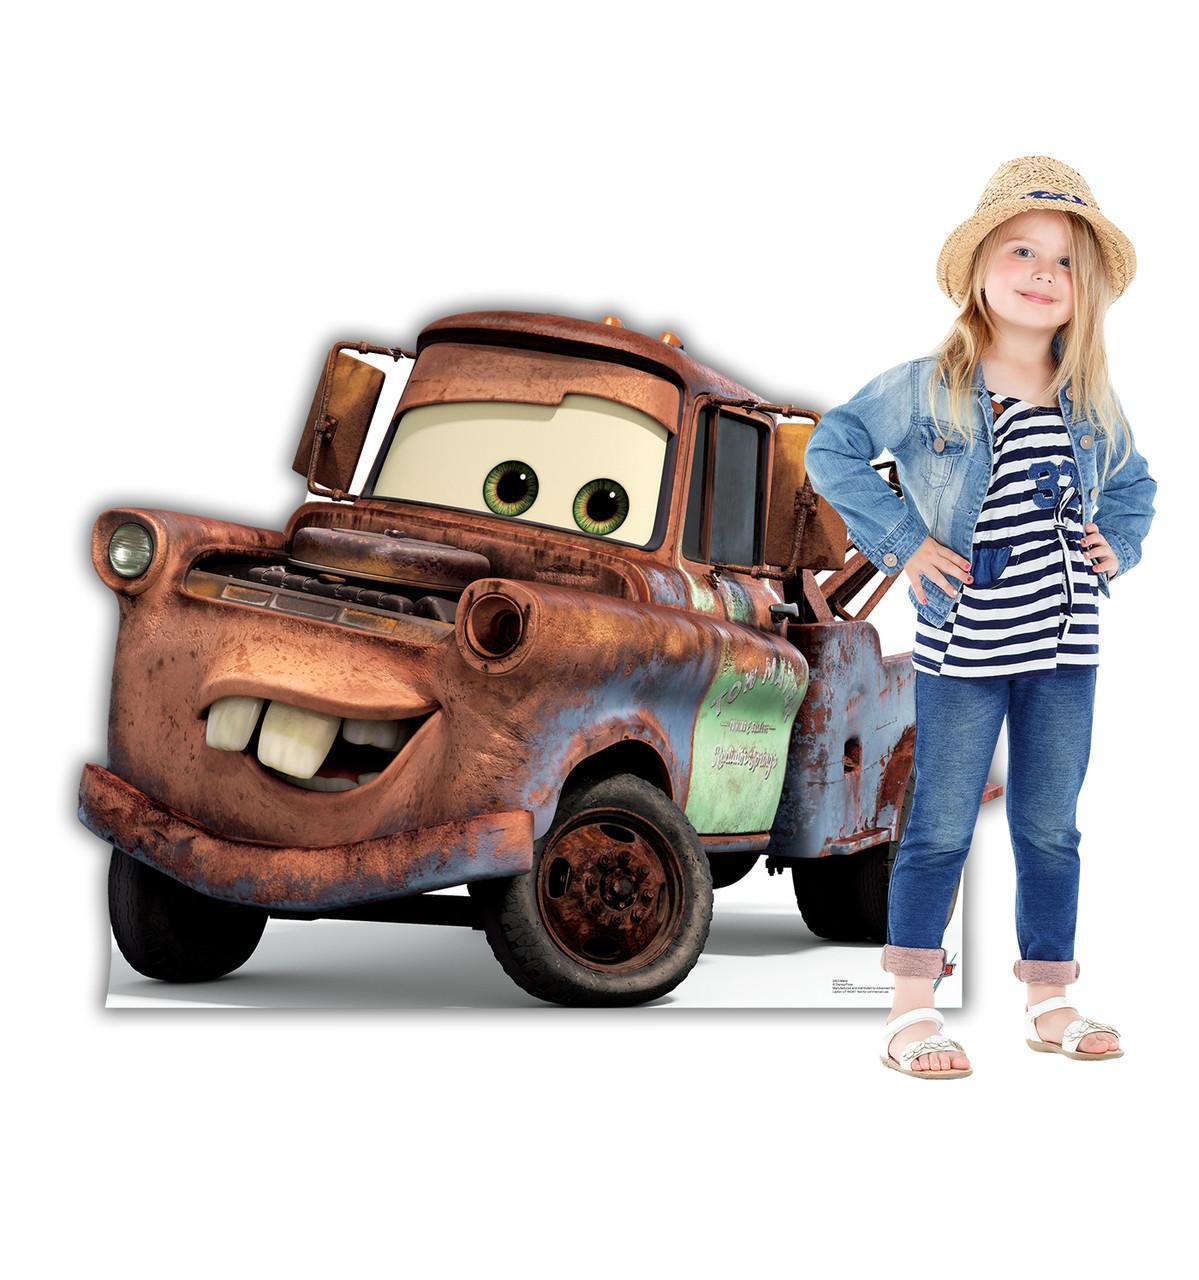 Life-size Mater (Cars 3) Cardboard Standup 2